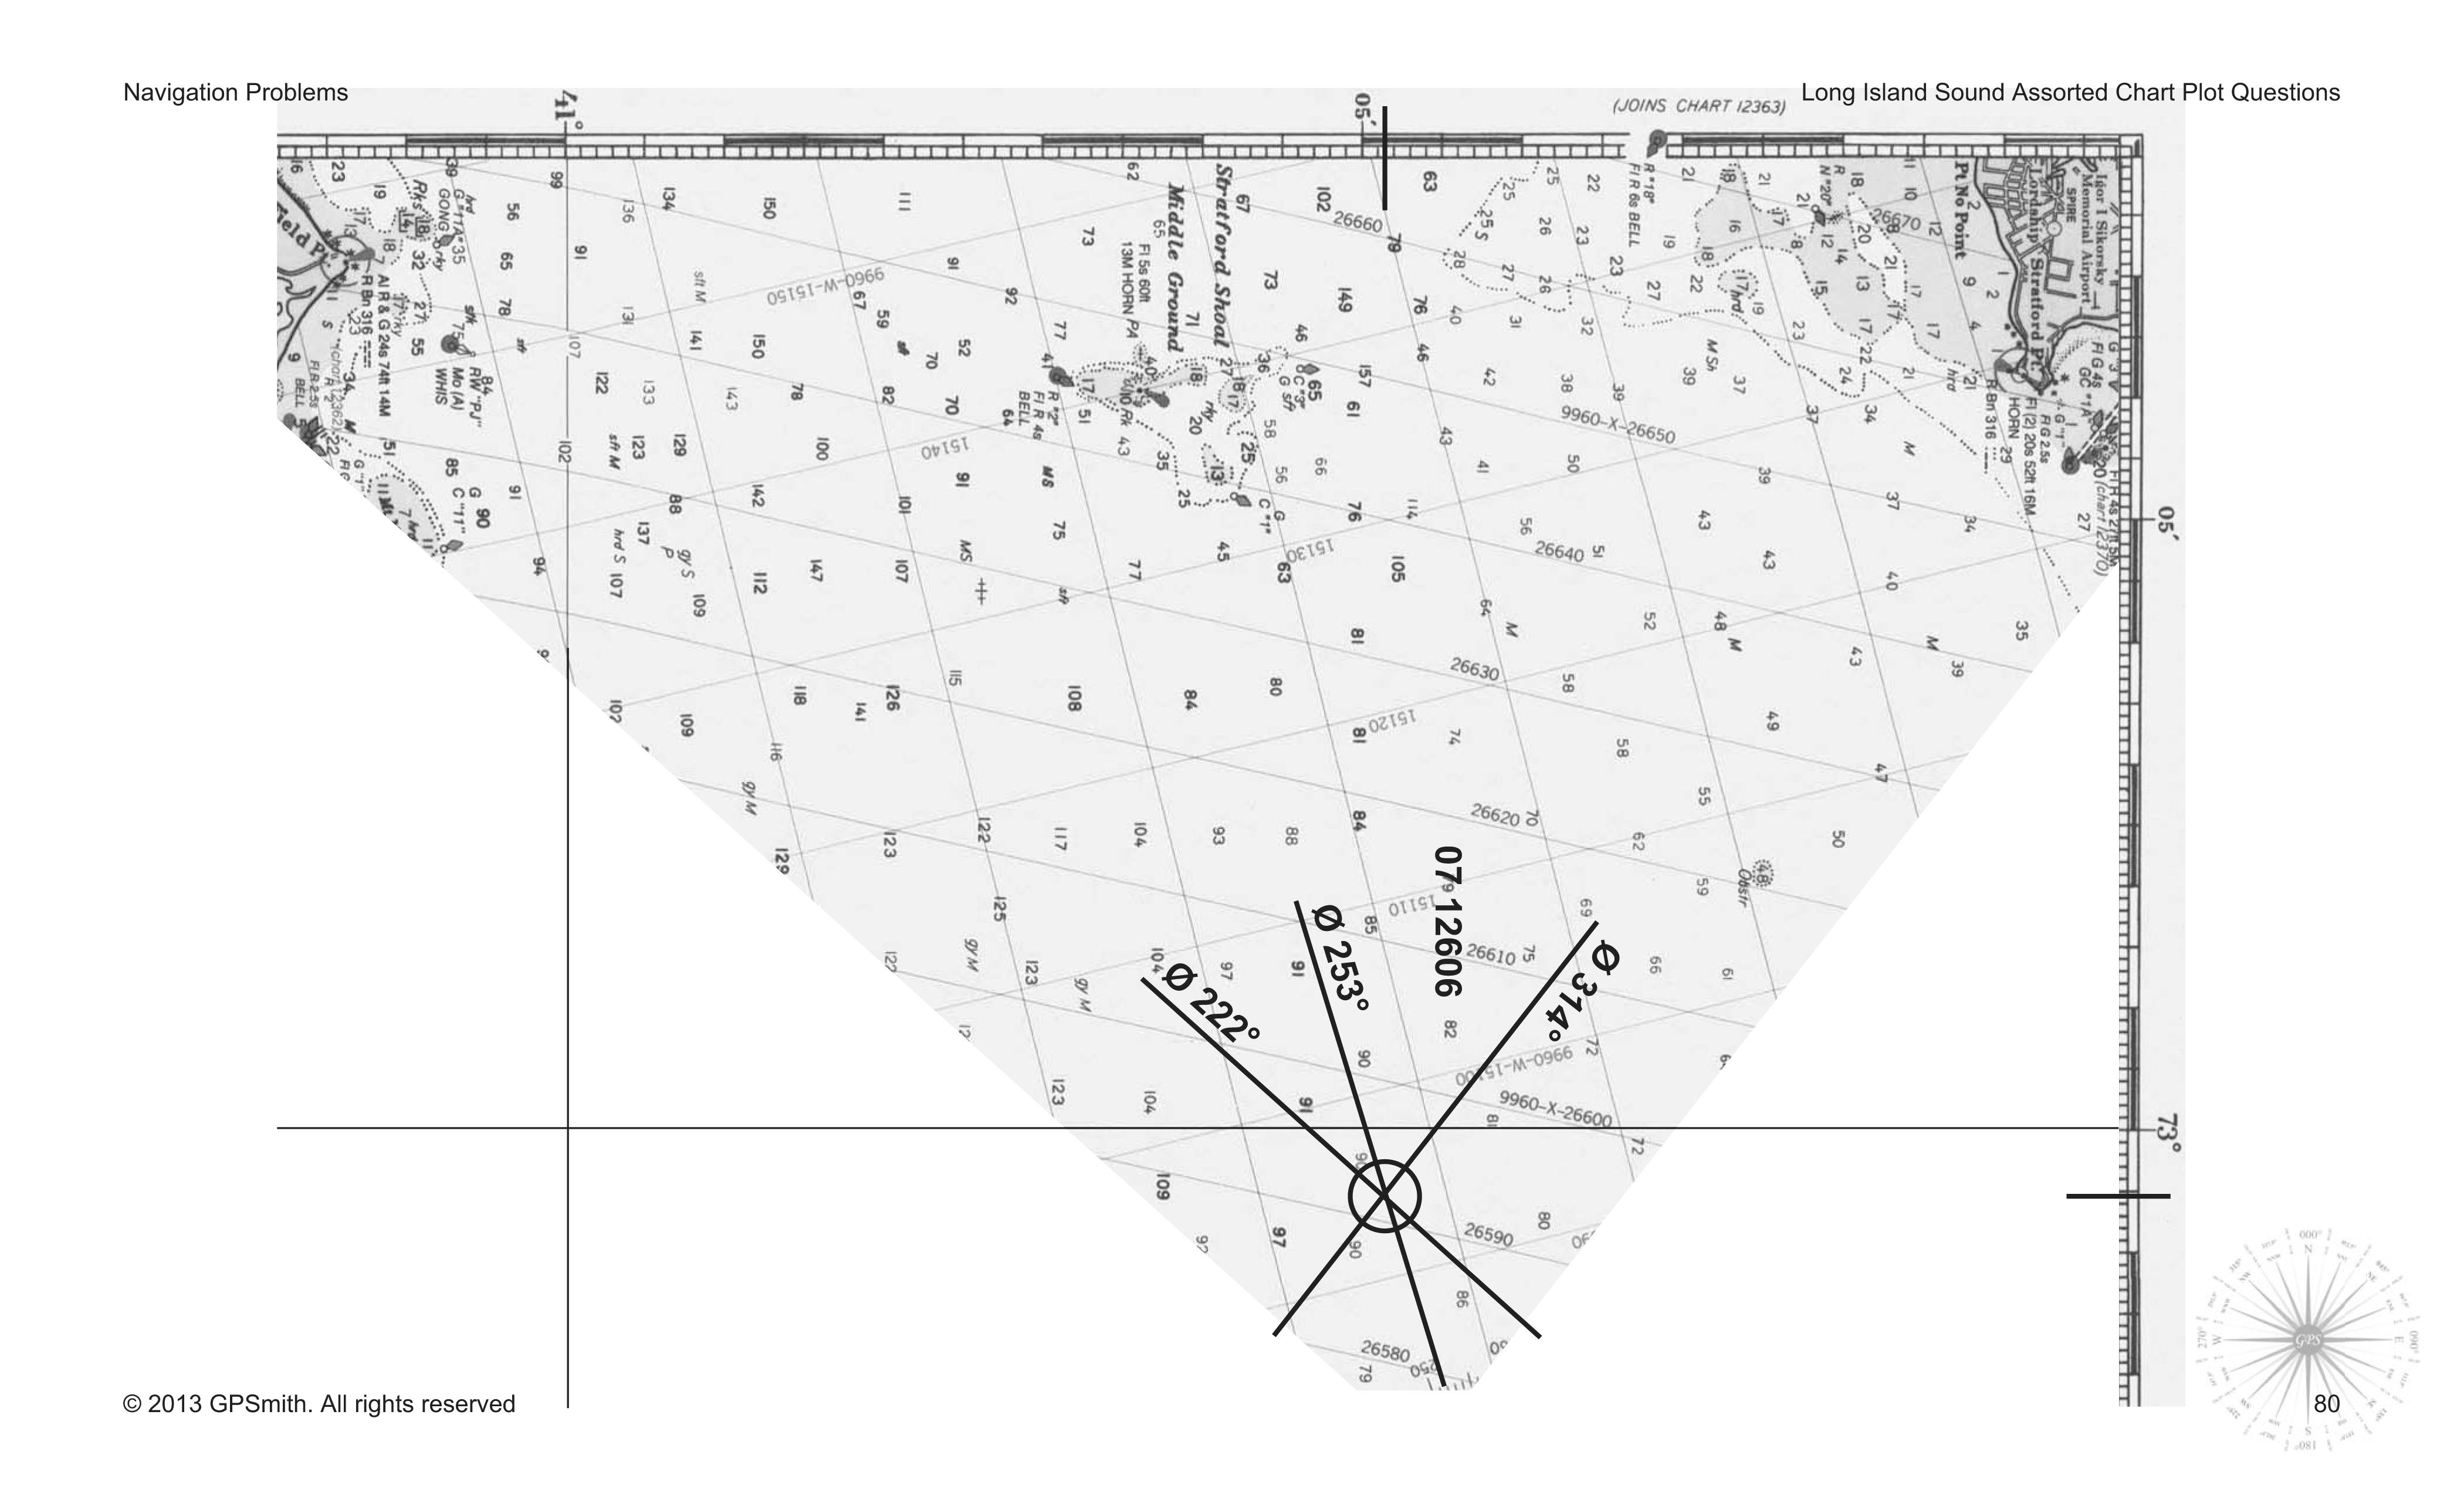 Individual-Chart-Plot-Questions-LIS-p-80